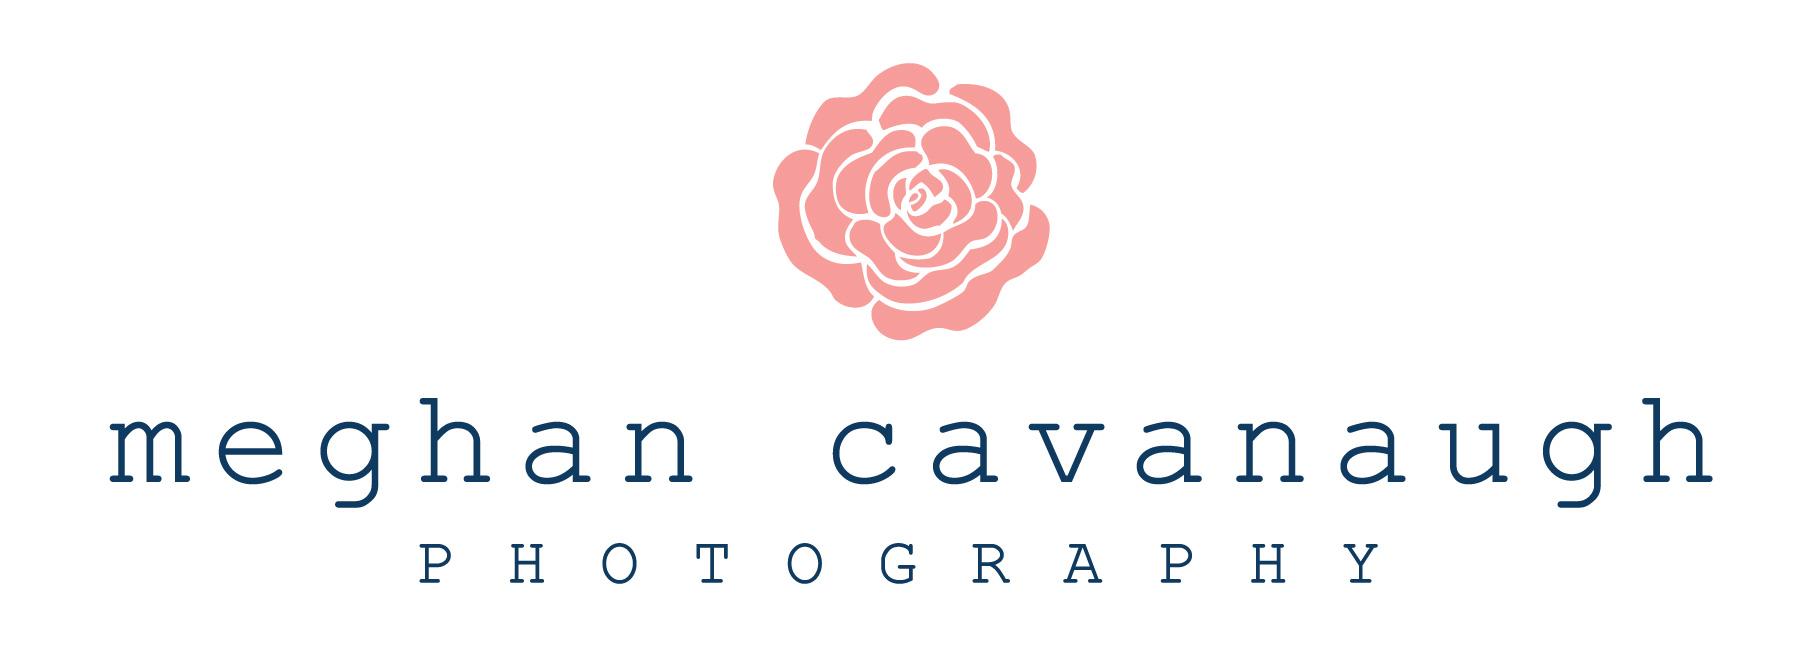 Meghan Cavanaugh Photography